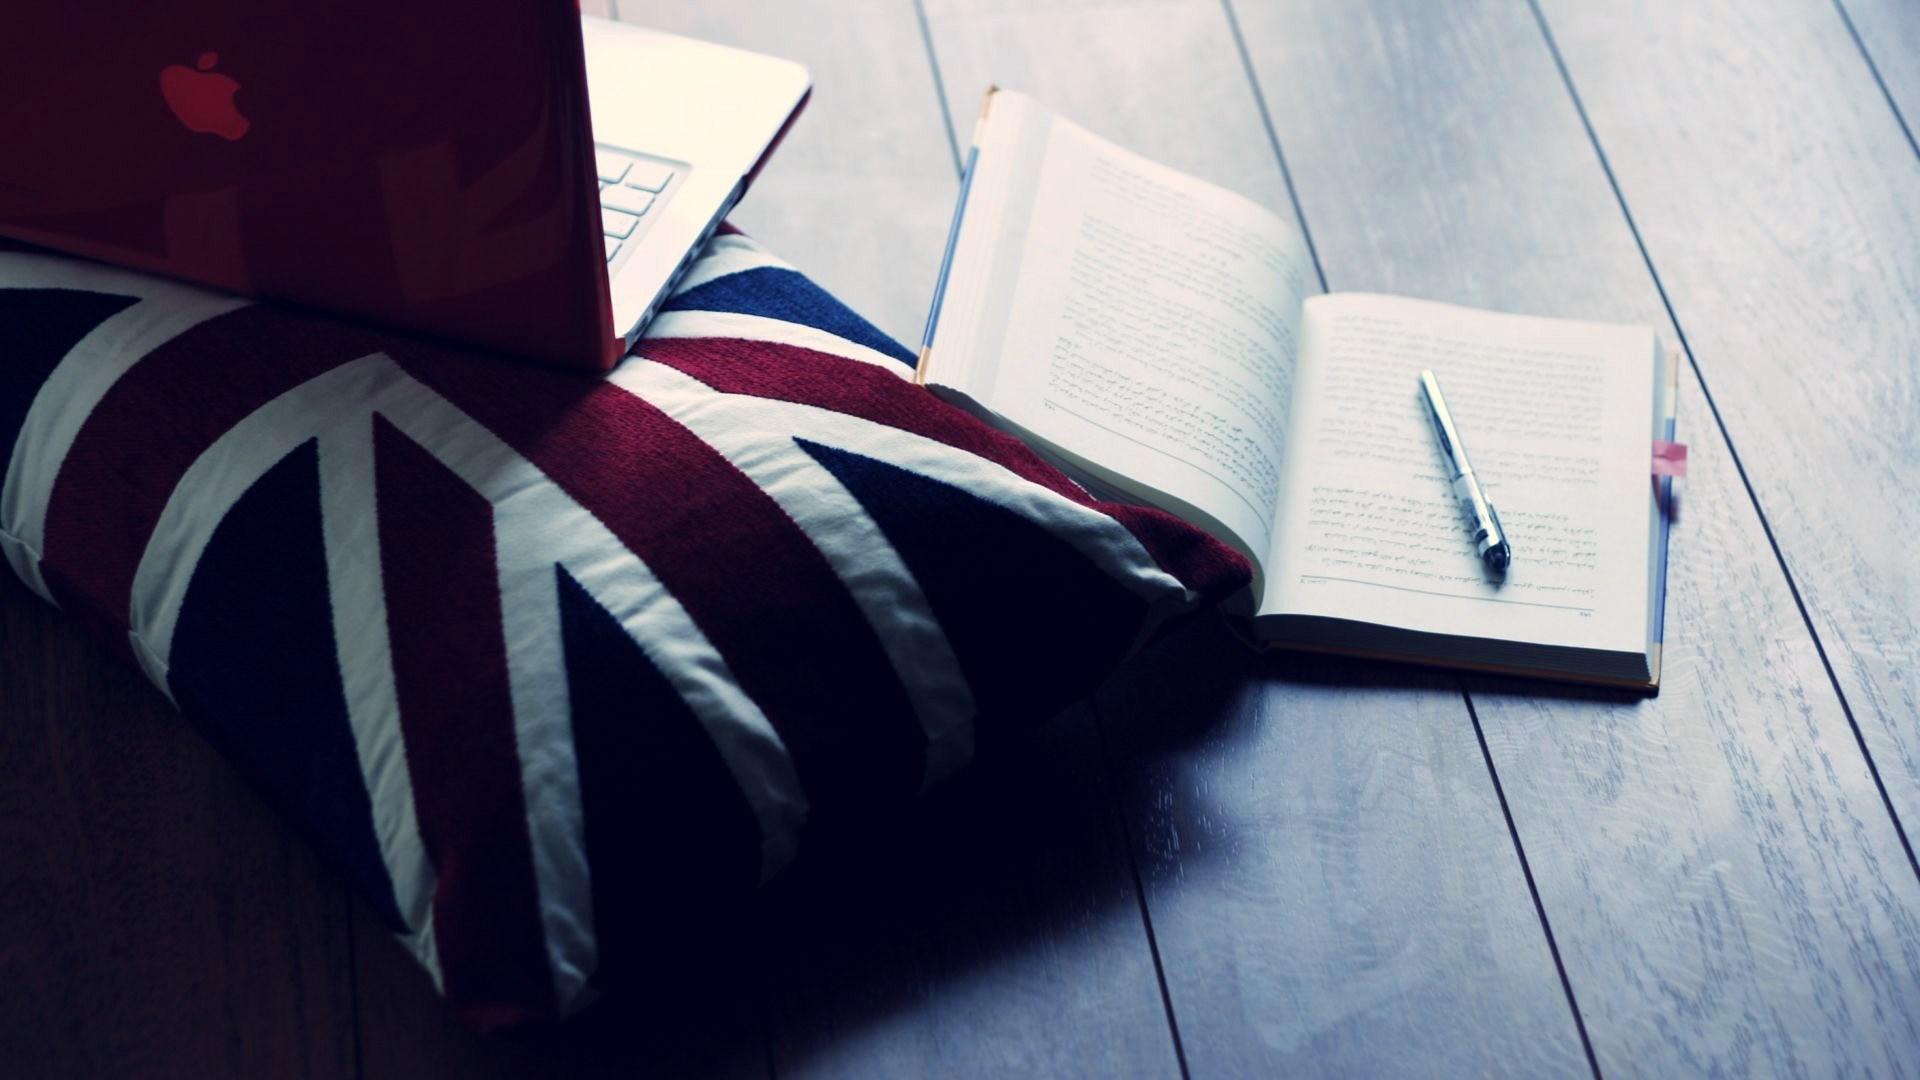 Pillow UK Flag MacBook Notebook